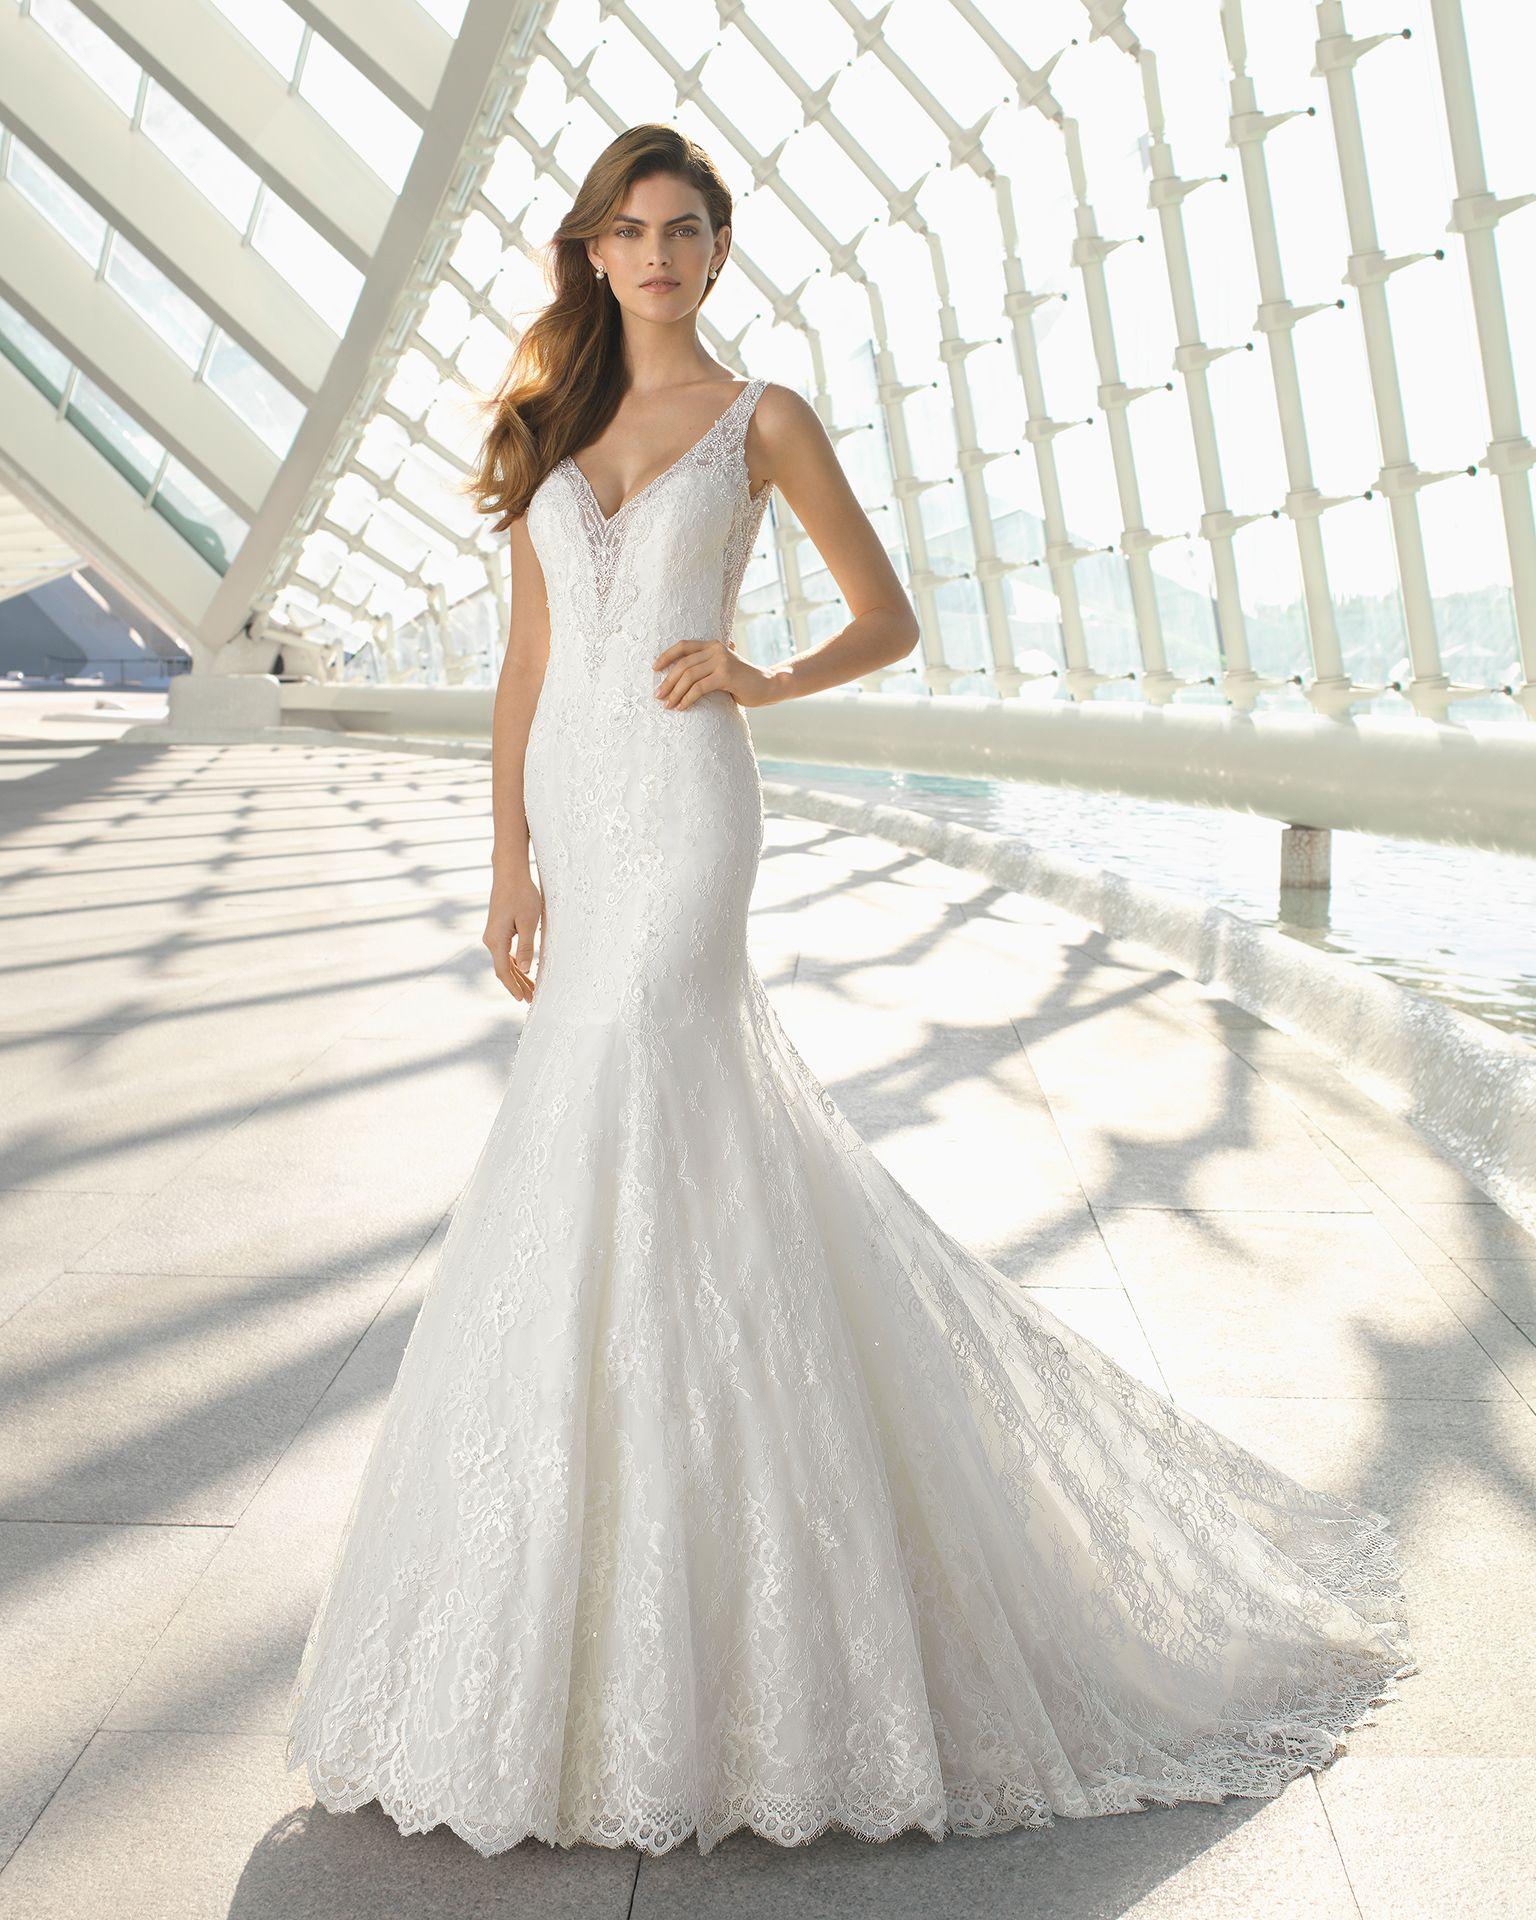 642db536f4 Vestidos de novia Rosa Clará 2019 ceñido con escote en V  vestidosdenovia   rosaclaranovias